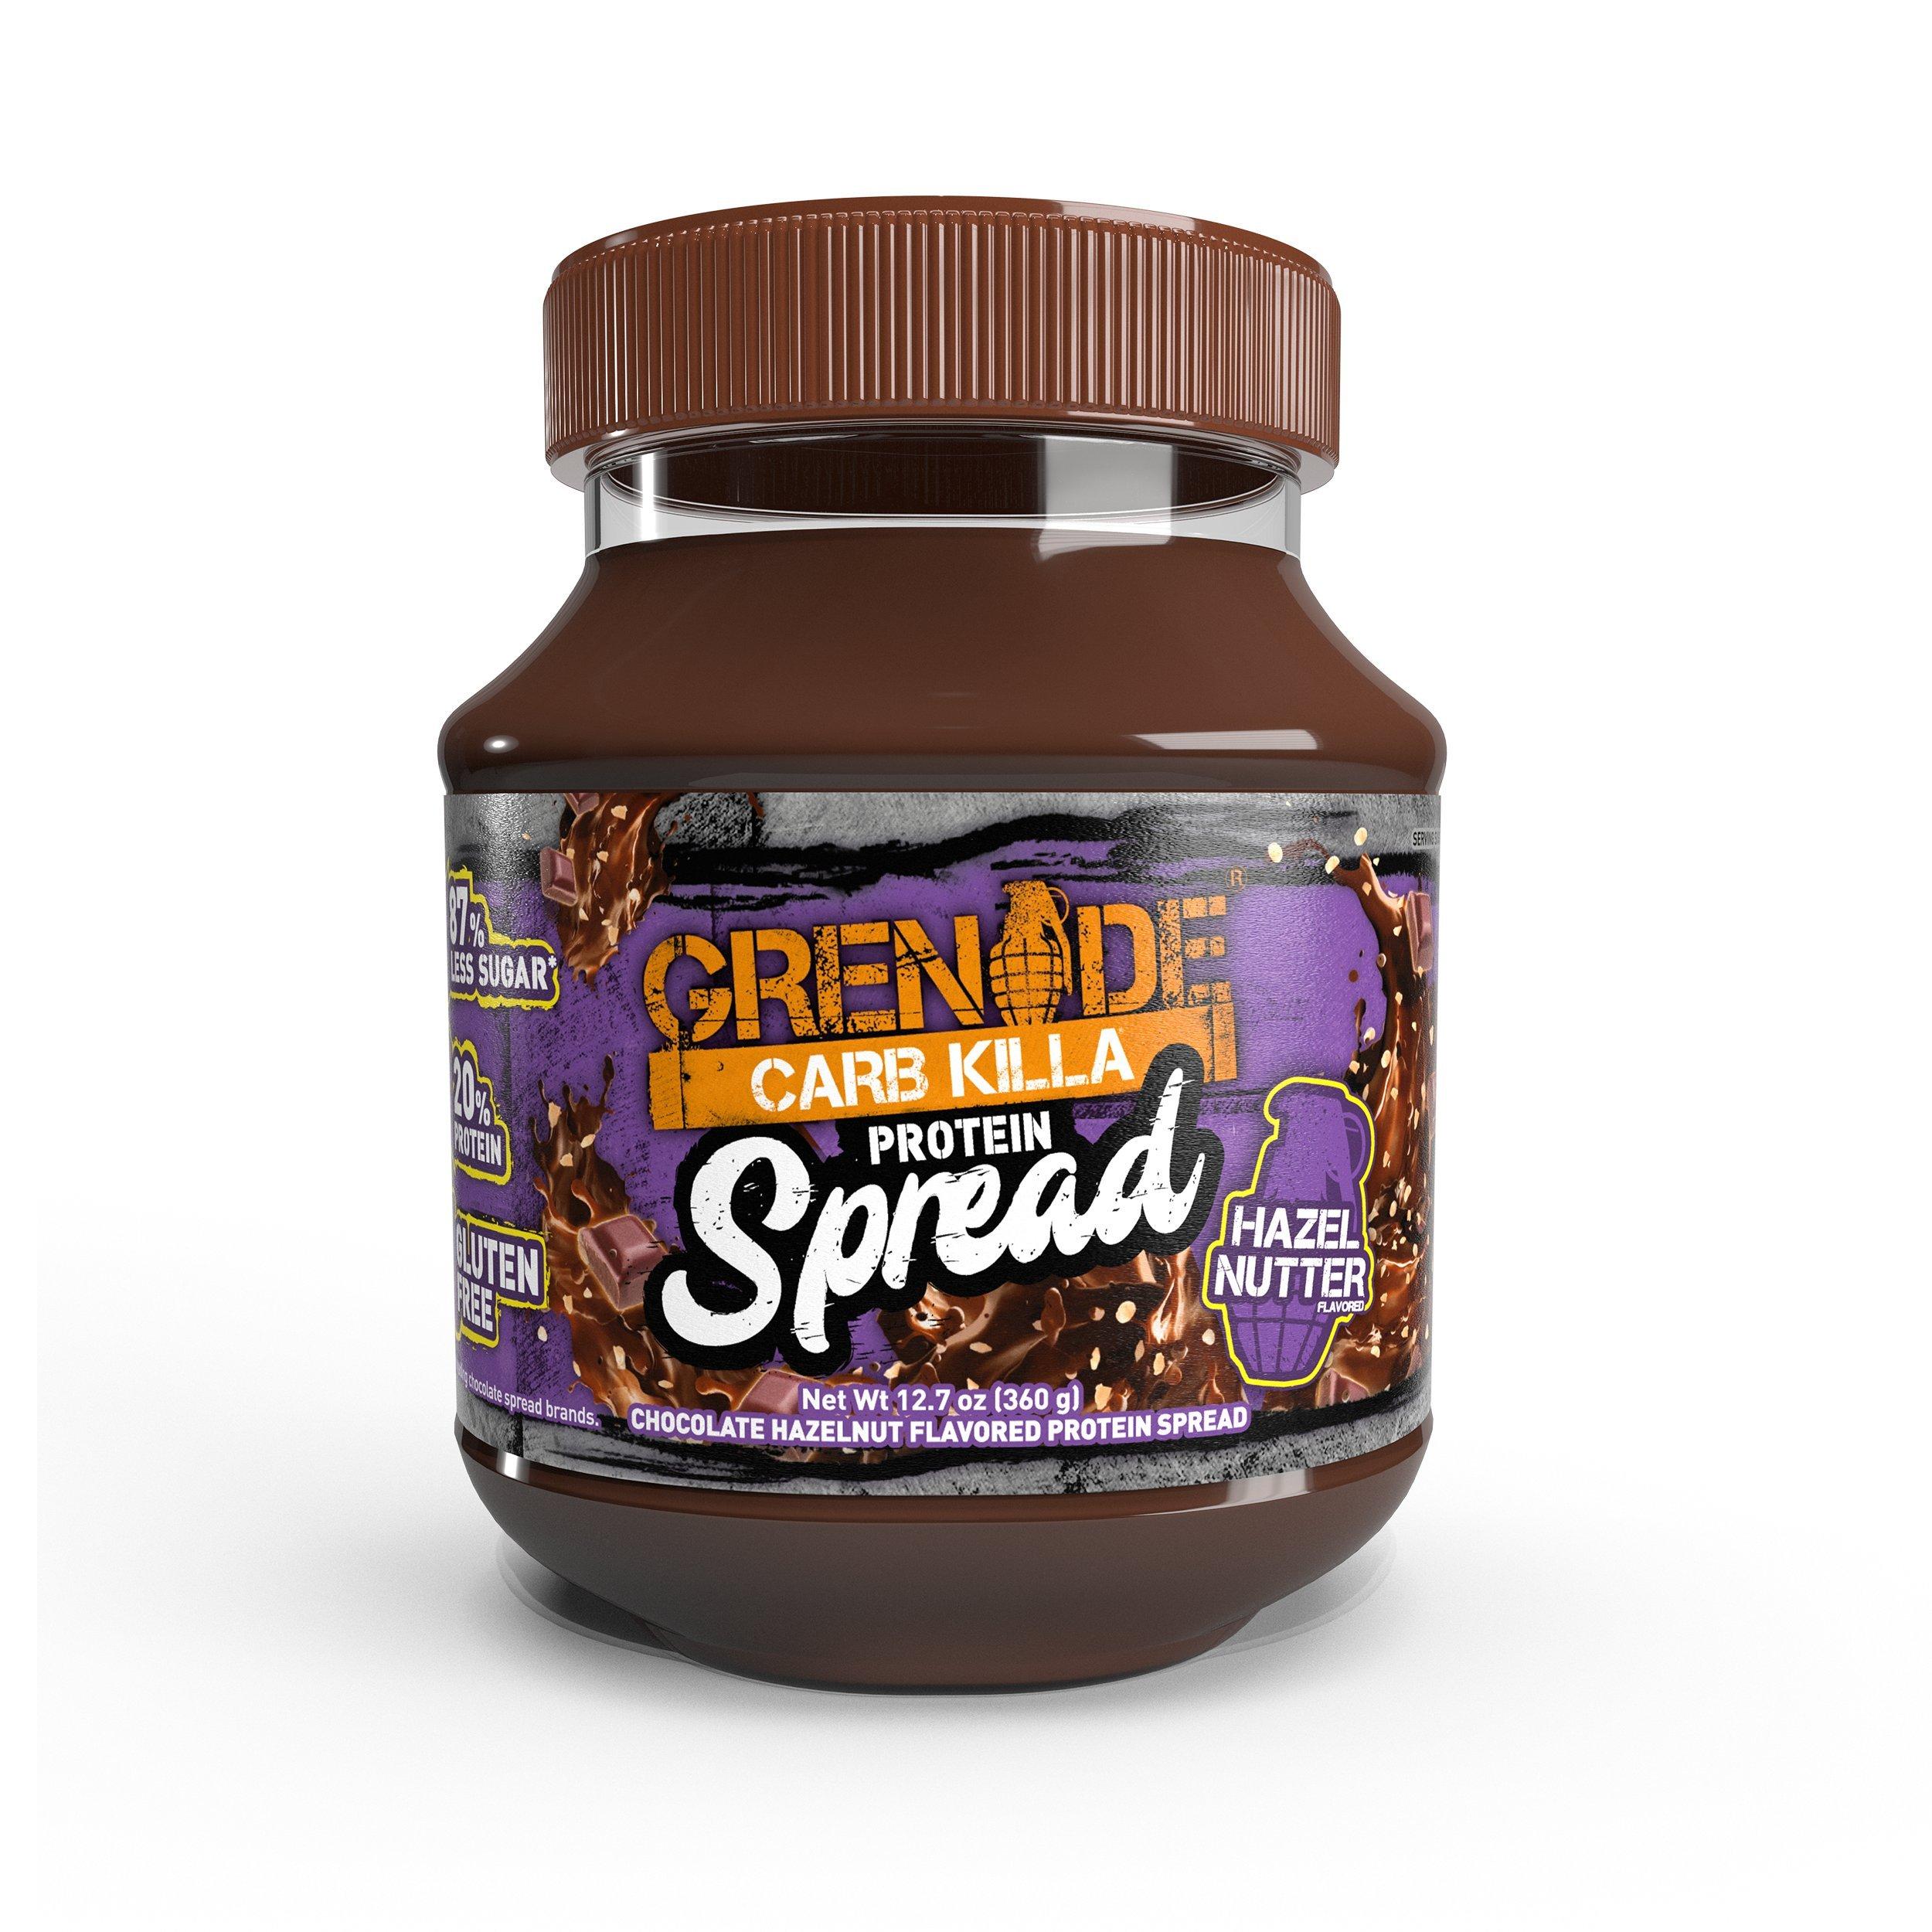 Grenade Carb Killa Protein Chocolate Spread | 7g High Protein Hazelnut Snack | Keto Friendly Low Net Carb Low Sugar | Gluten Free No Stir | Hazel Nutter, 12.7oz by Grenade